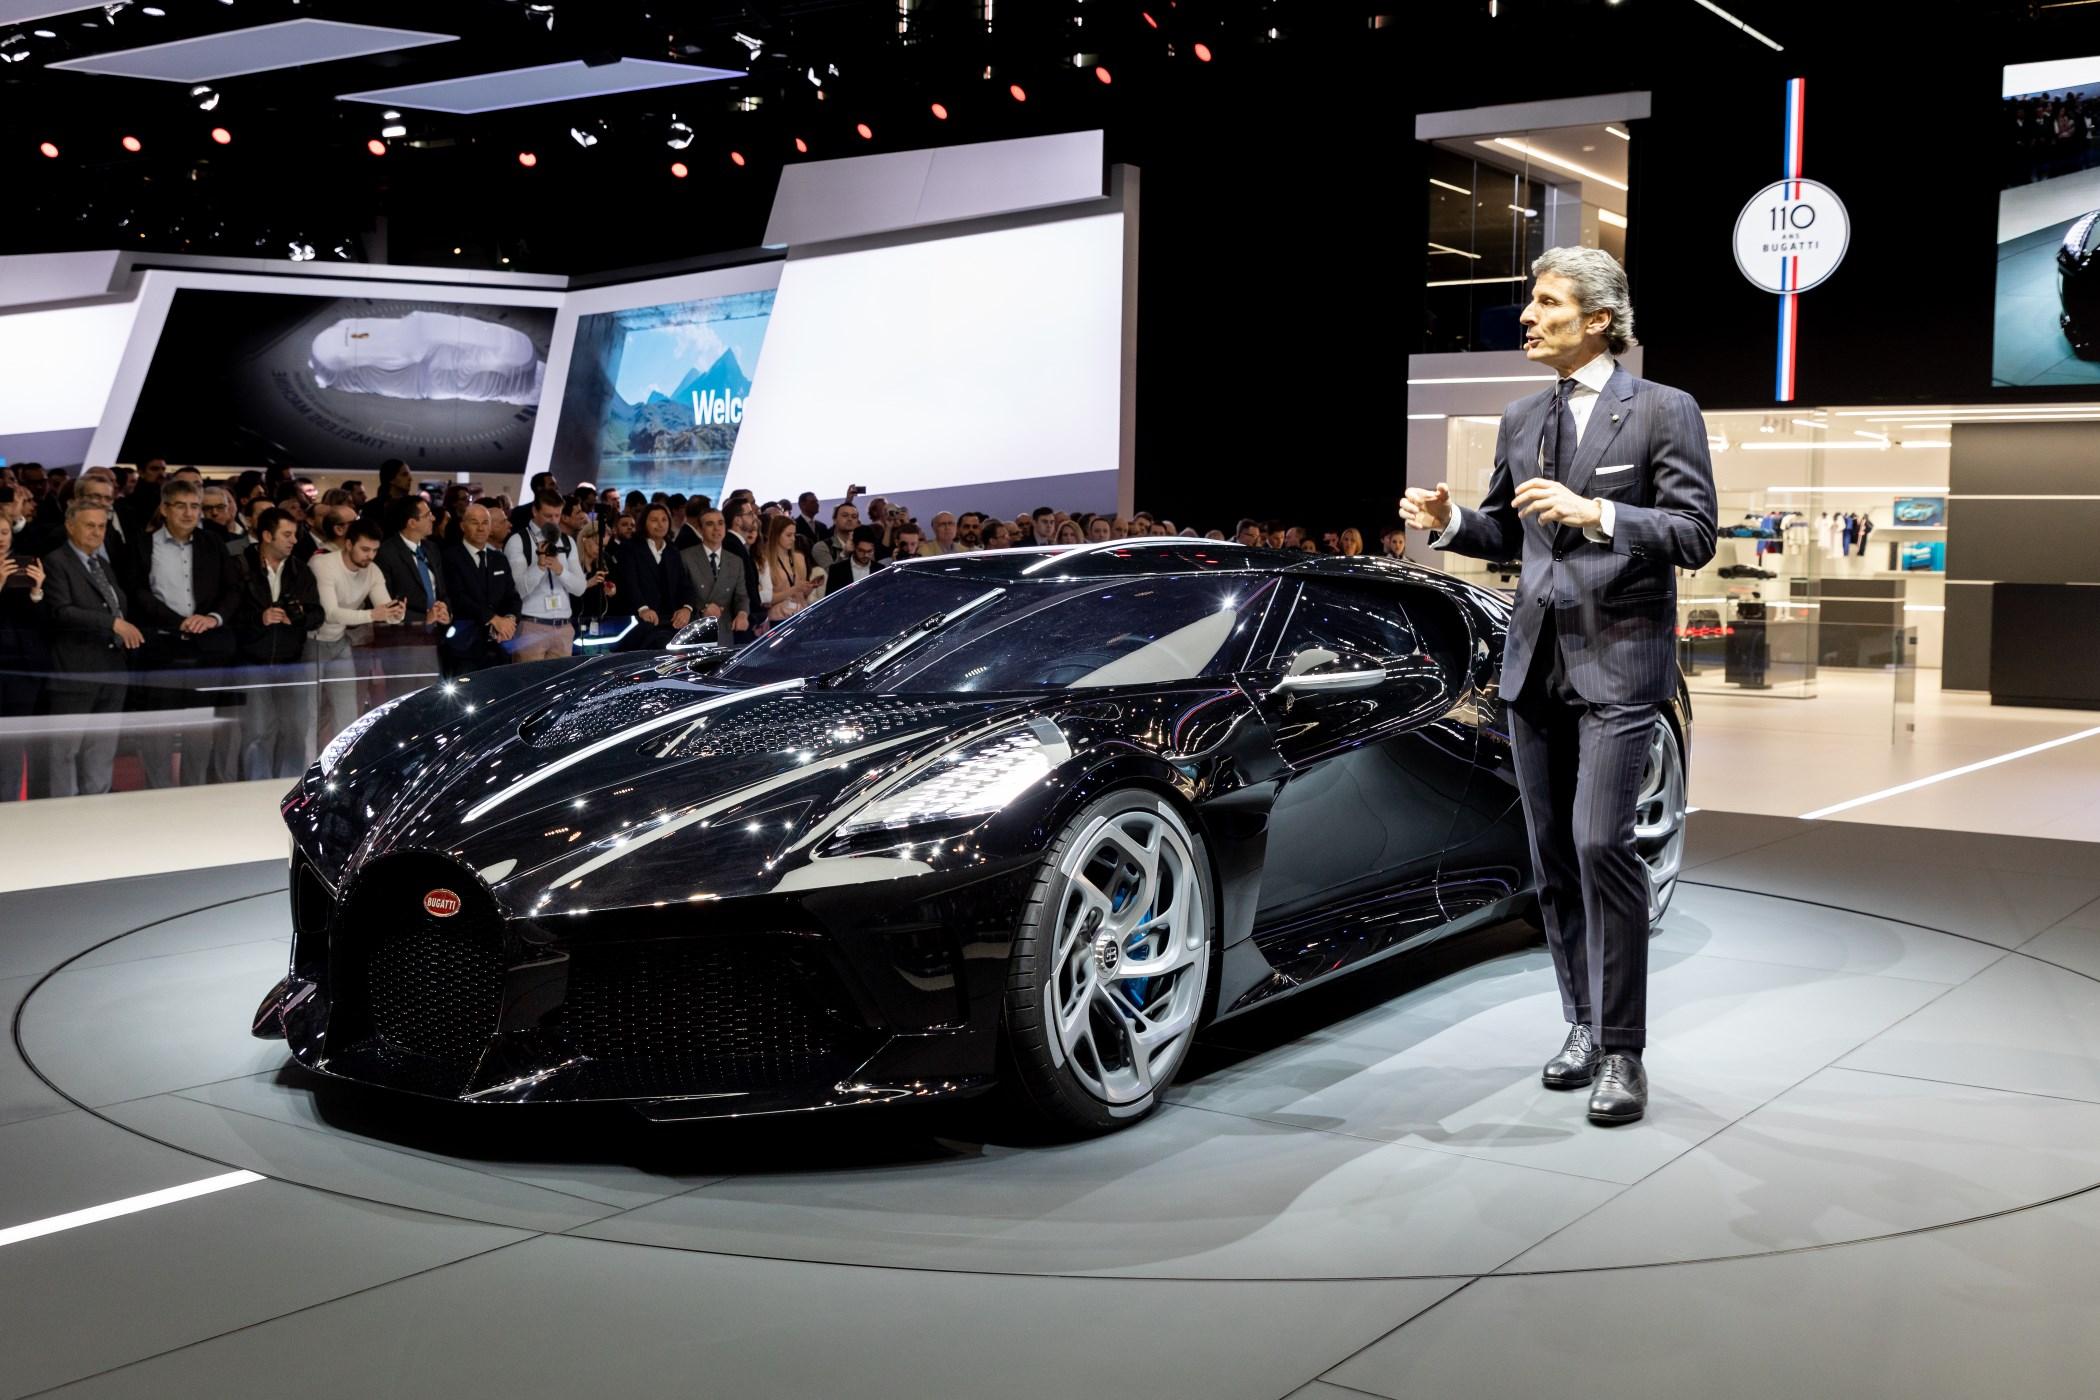 La-Voiture-Noire'-by-Bugatti-2